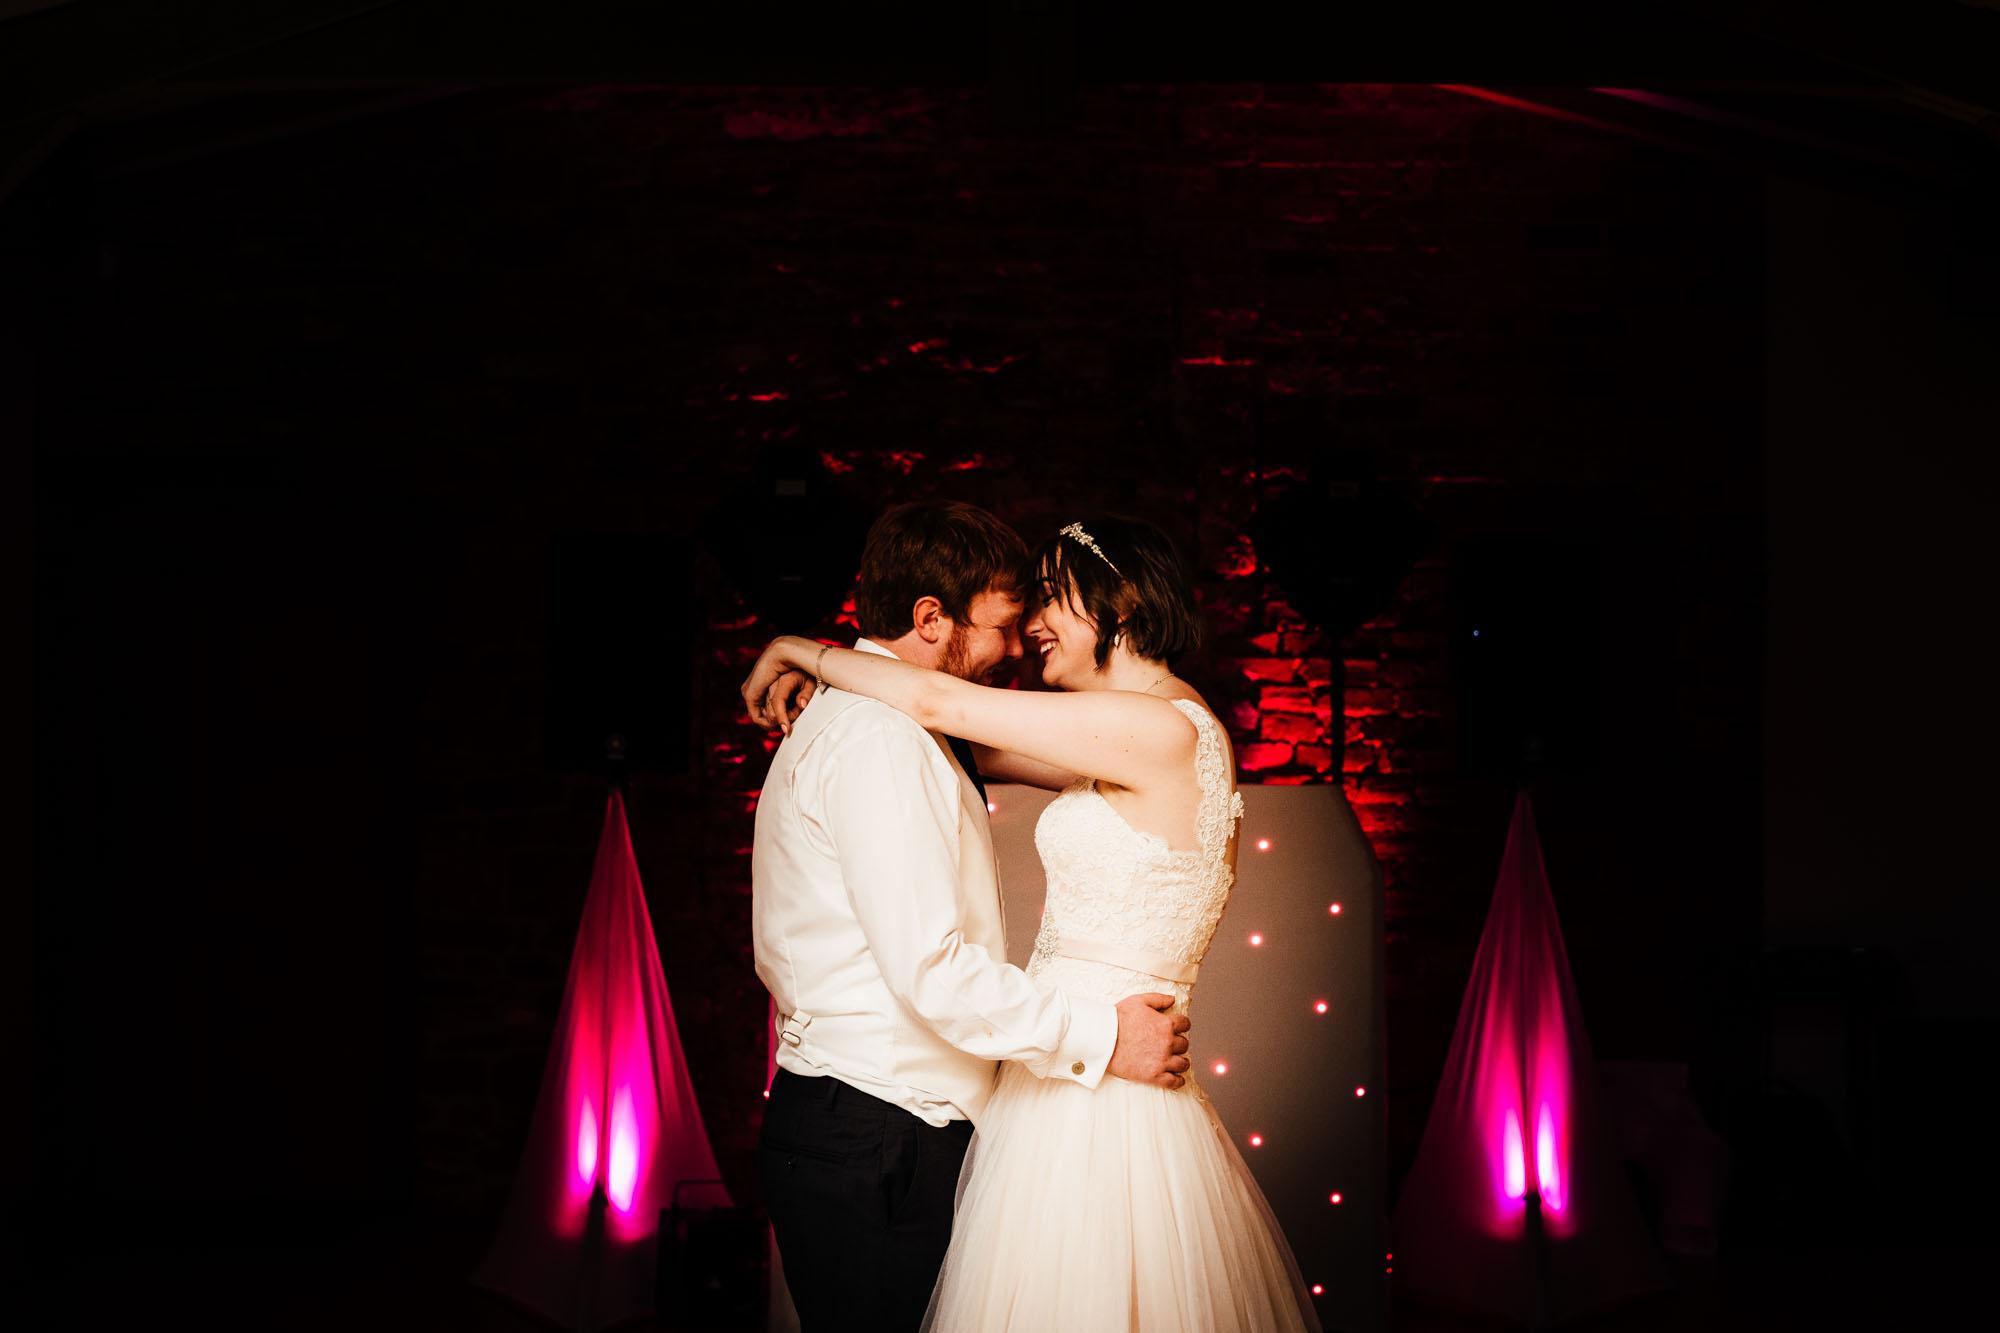 wedding-at-dodford-manor-76